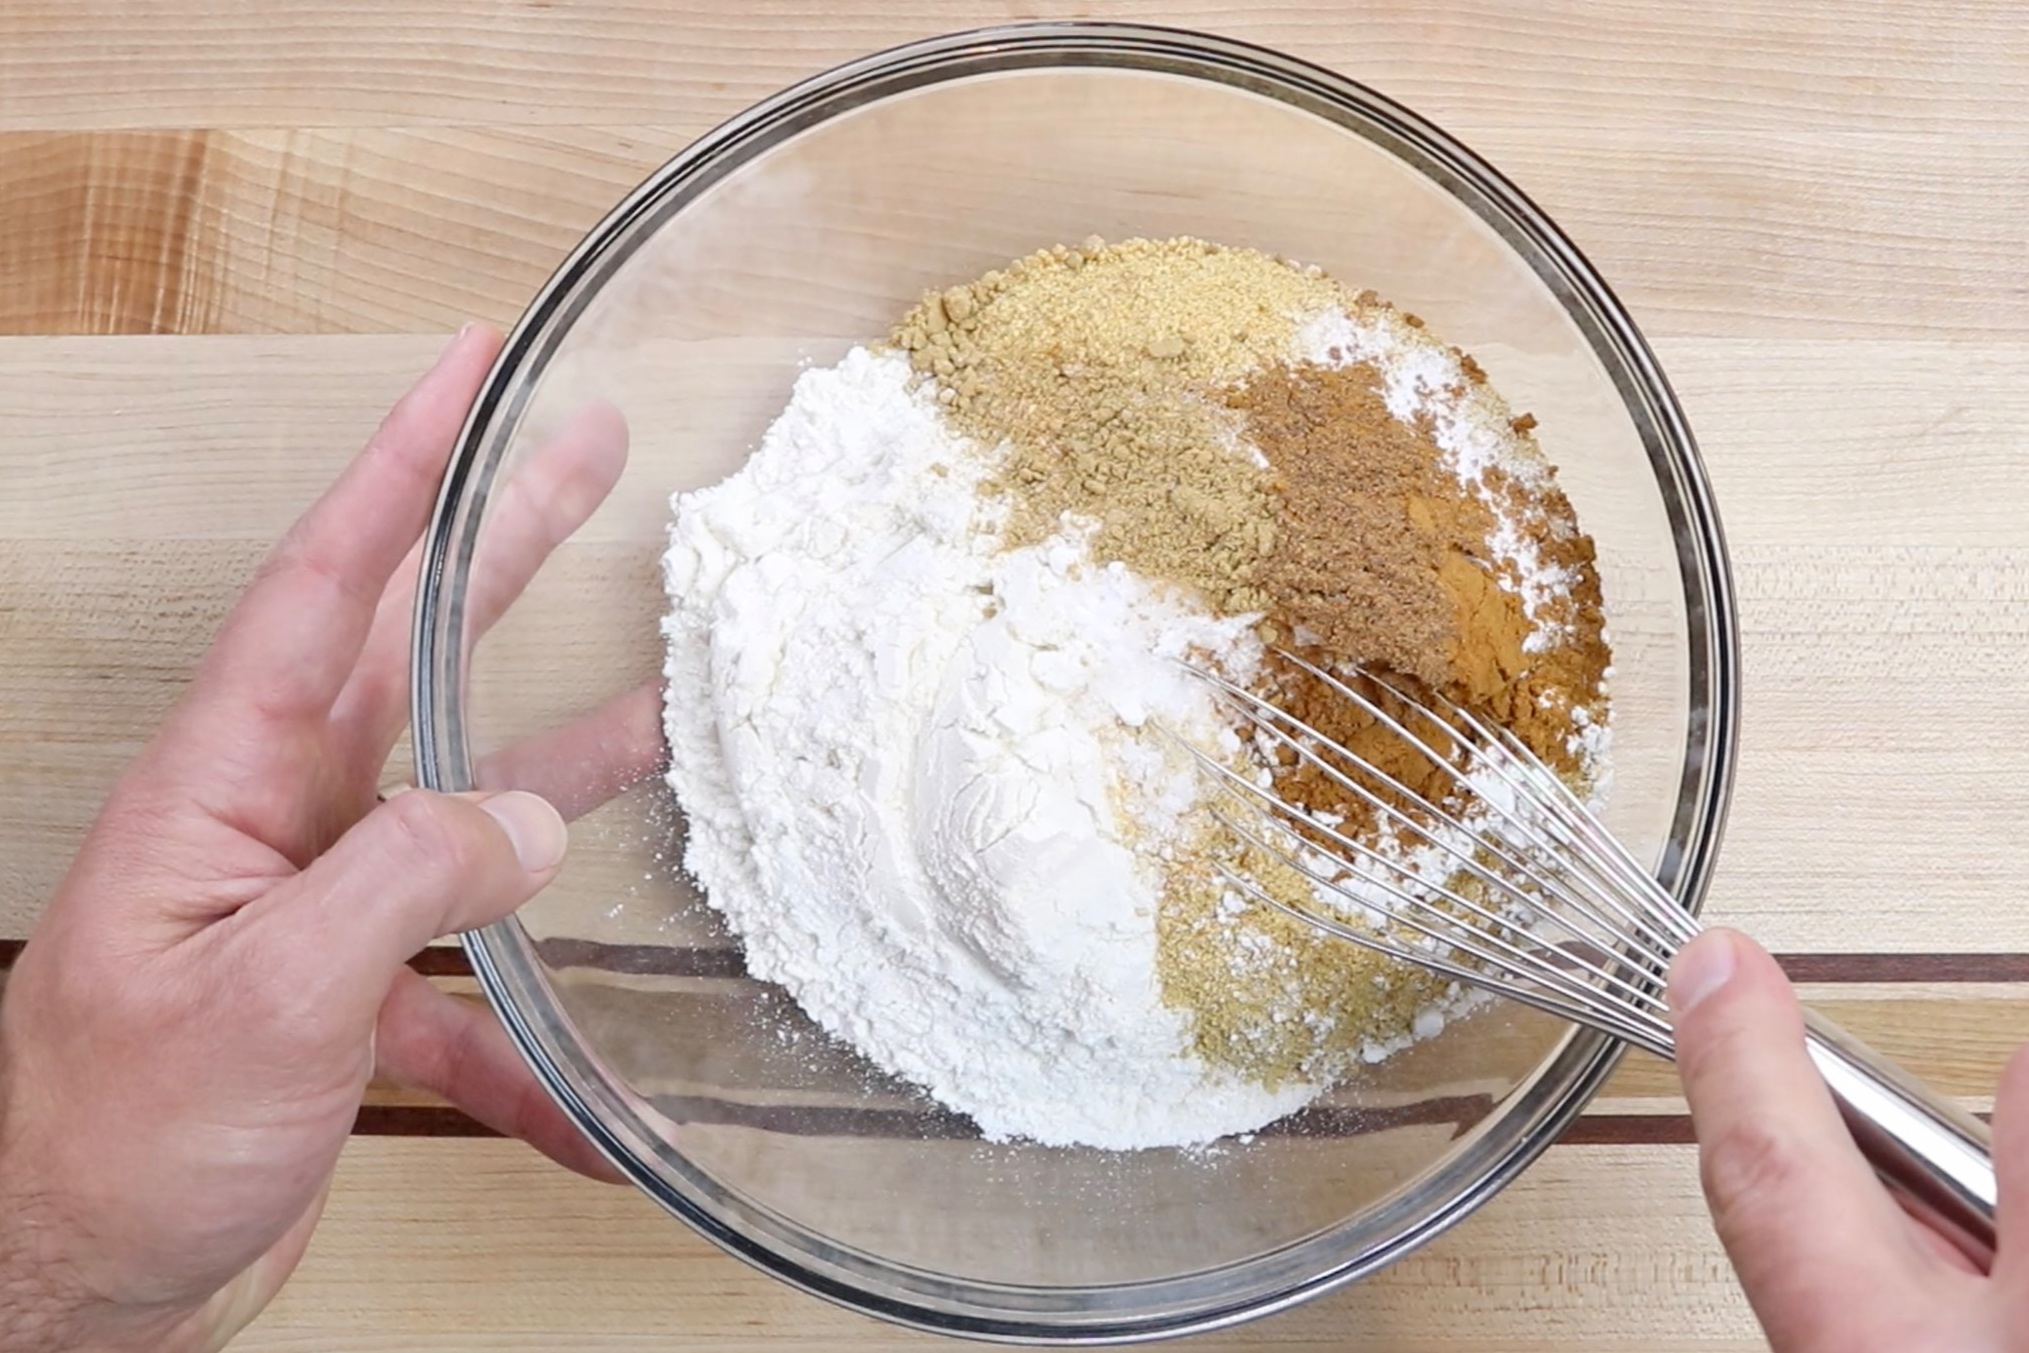 2. In a medium bowl add flour, graham cracker crumbs, cornstarch, baking soda, baking powder, salt, nutmeg, ginger, and cloves. Whisk until incorporated. Set aside. -